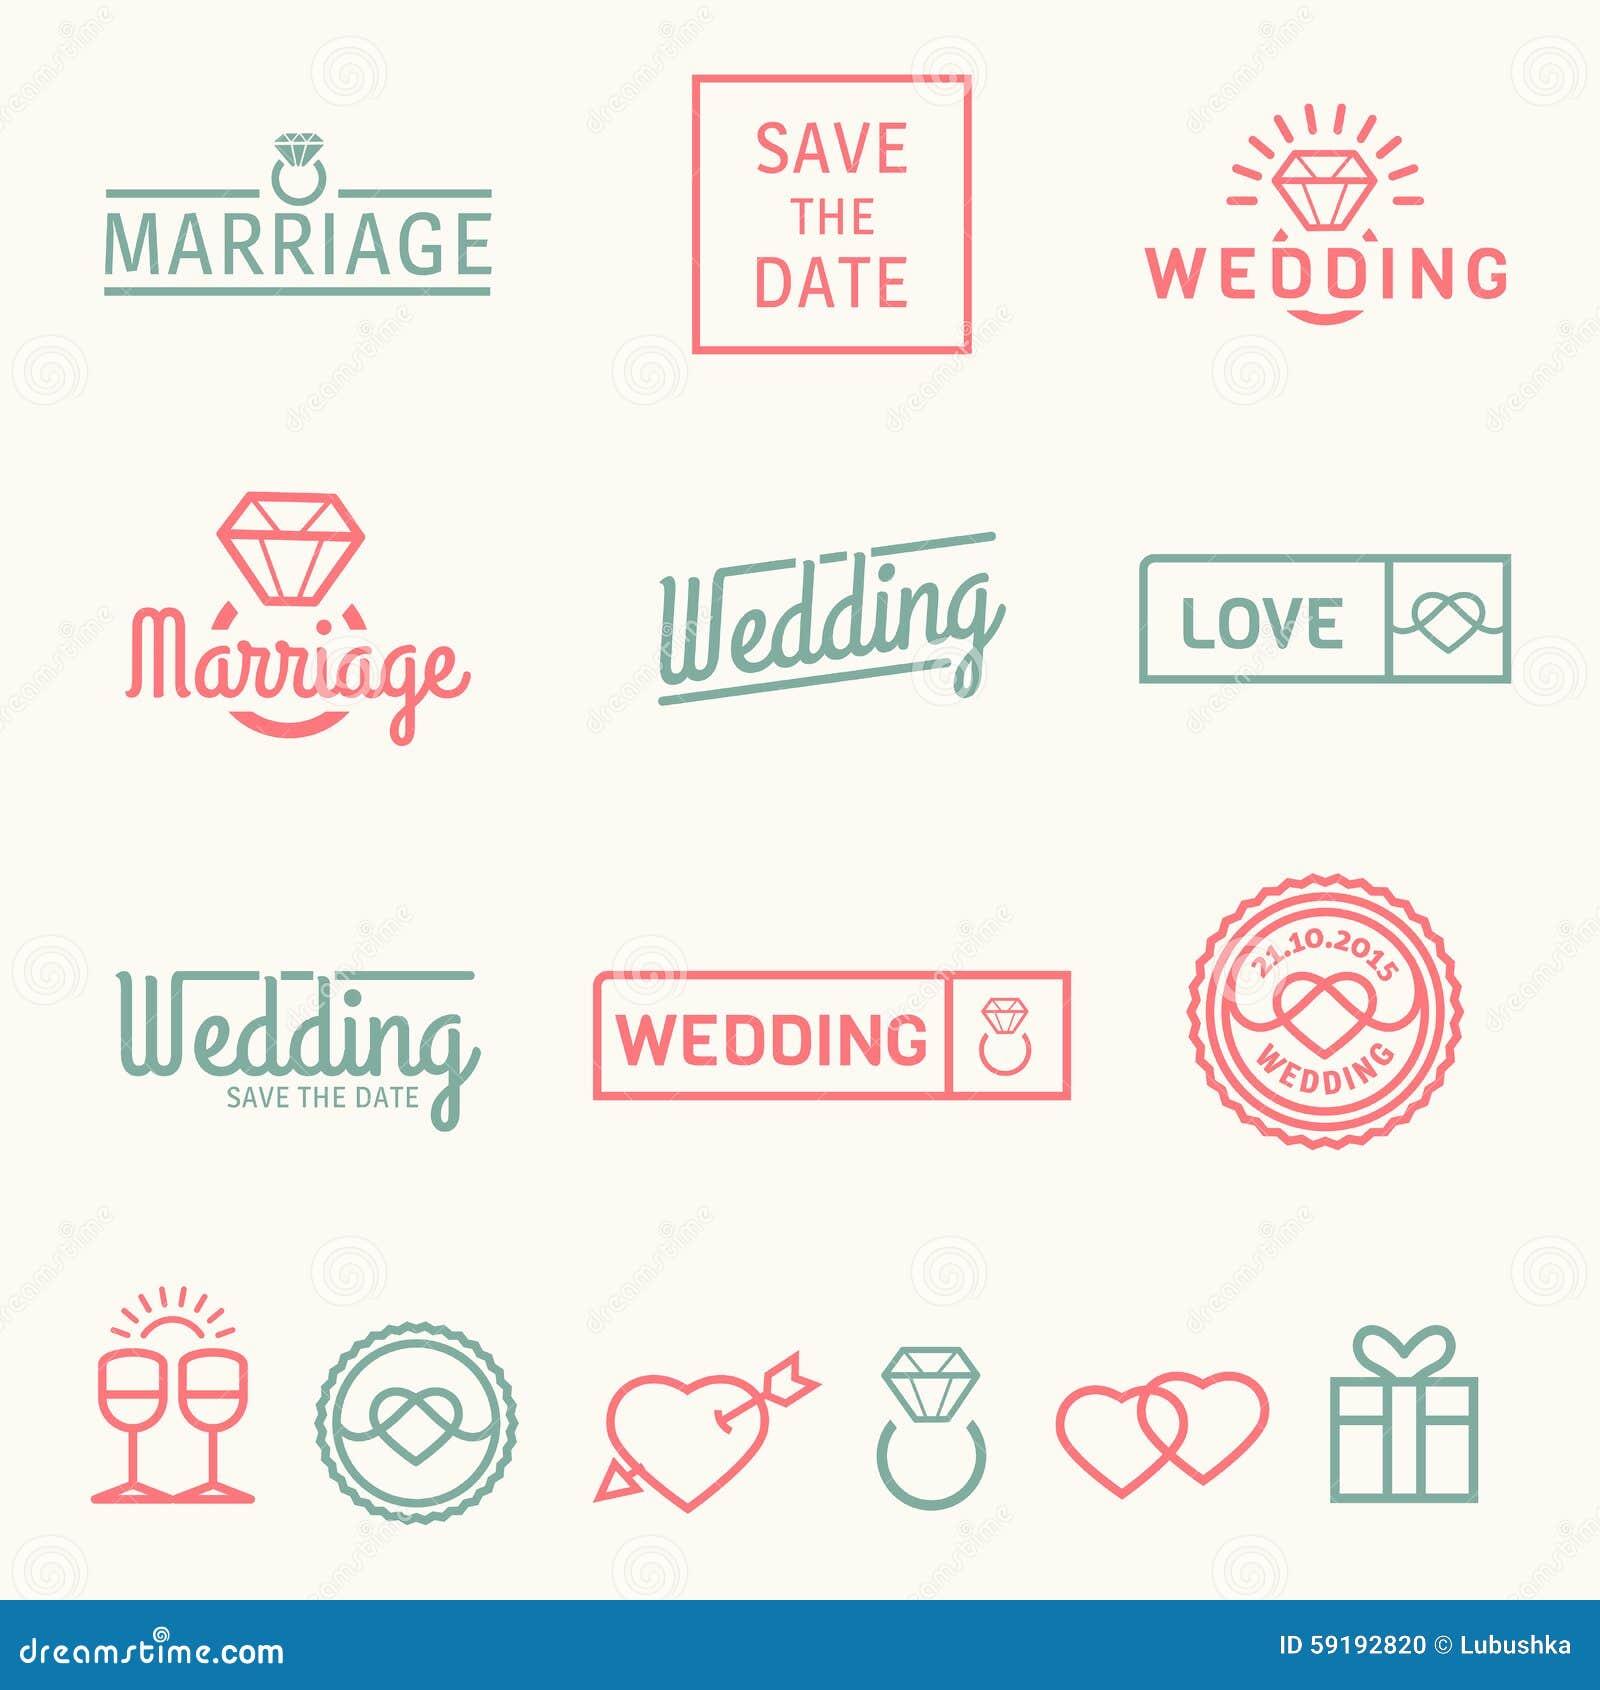 Wedding set icons and logos stock vector illustration of wedding set icons and logos m4hsunfo